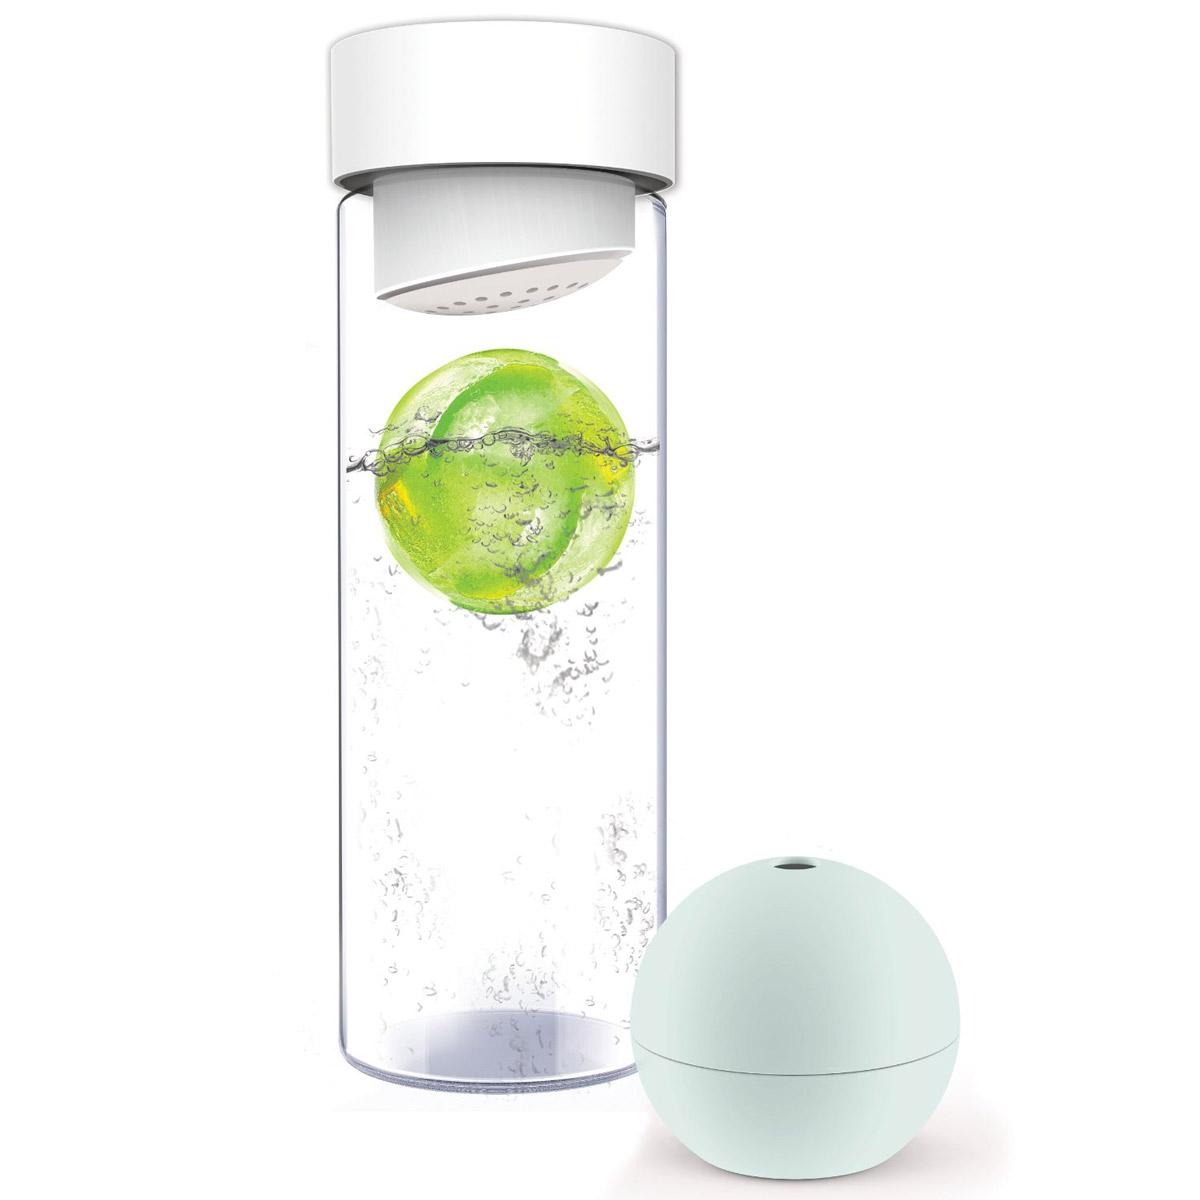 Ice Ball Flavor It Water Bottle The Green Head